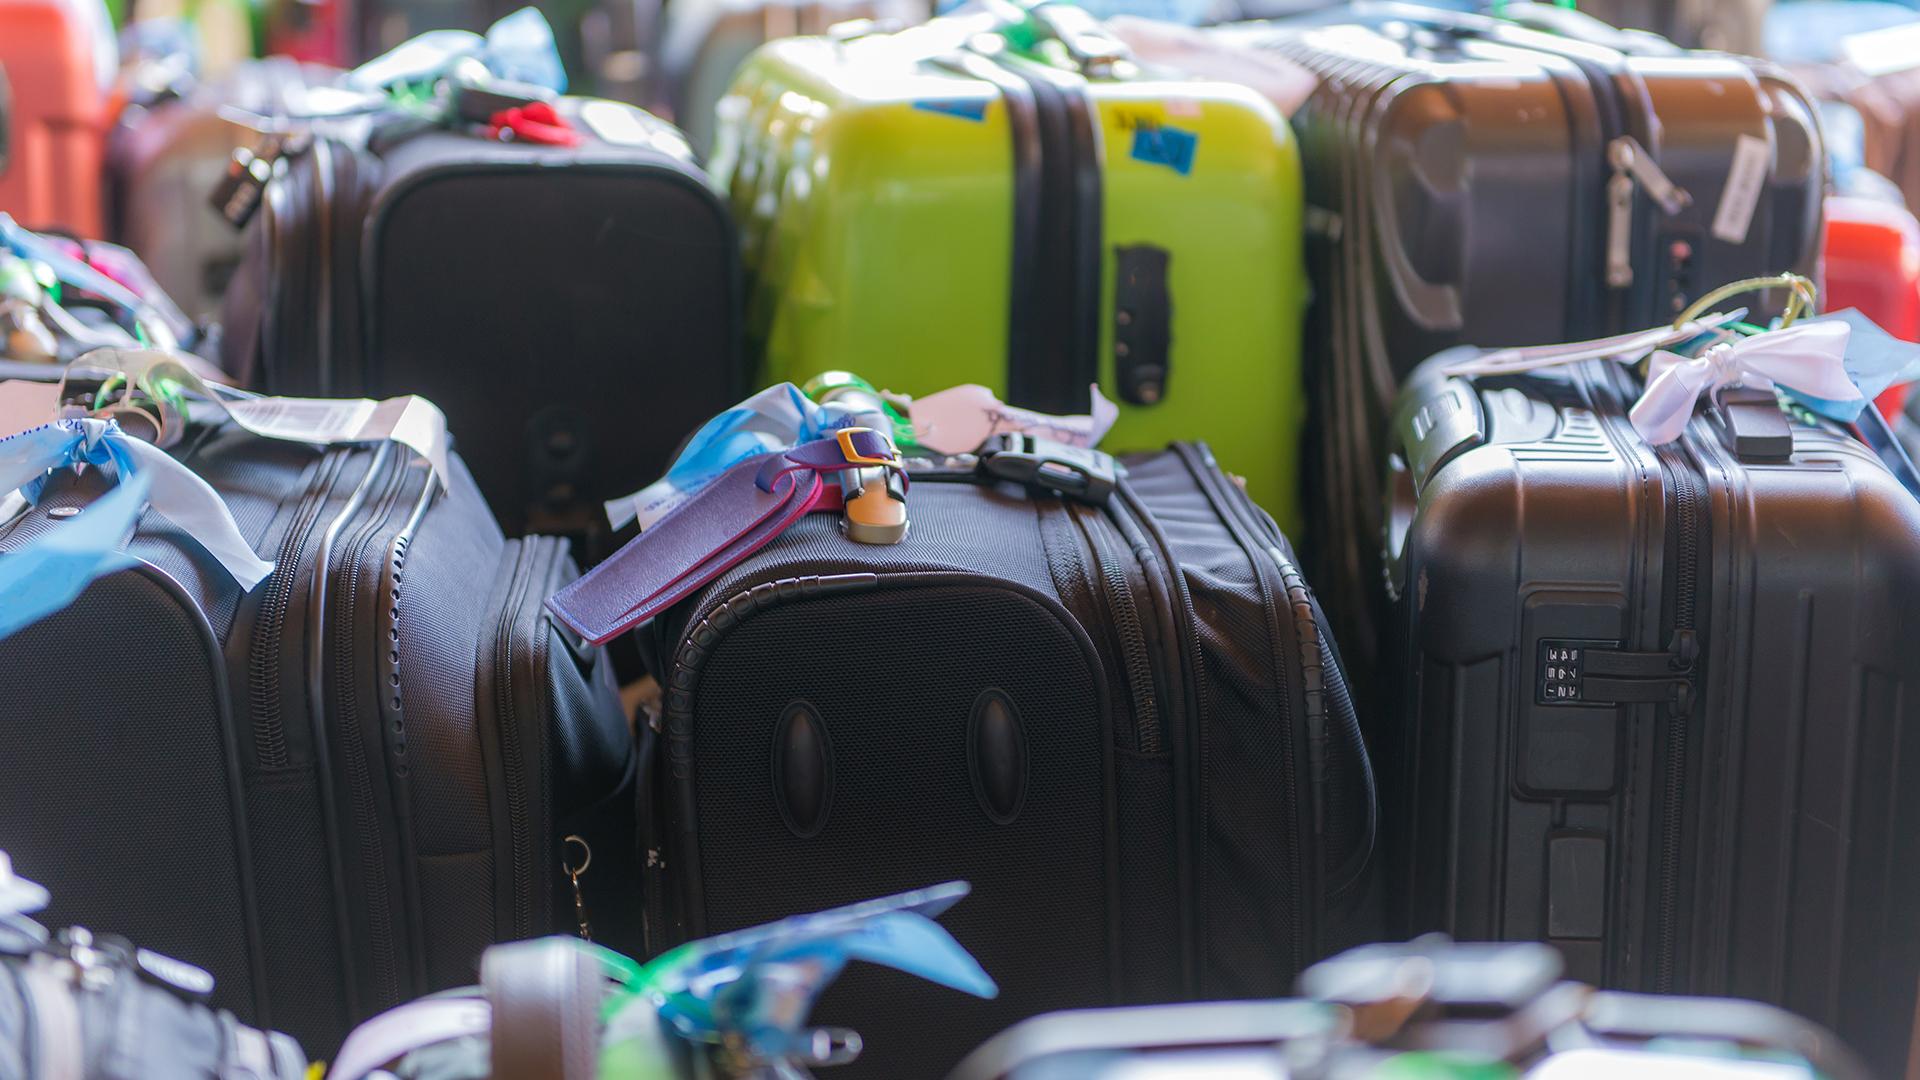 Awesome Tie Dye Overnight Bag Nylon Lightweight Tote Luggage Bag Waterproof Luggage Hanging Bag Hiking Hiking Travel Duffle Bag Weekend Bags In Trolley Handle